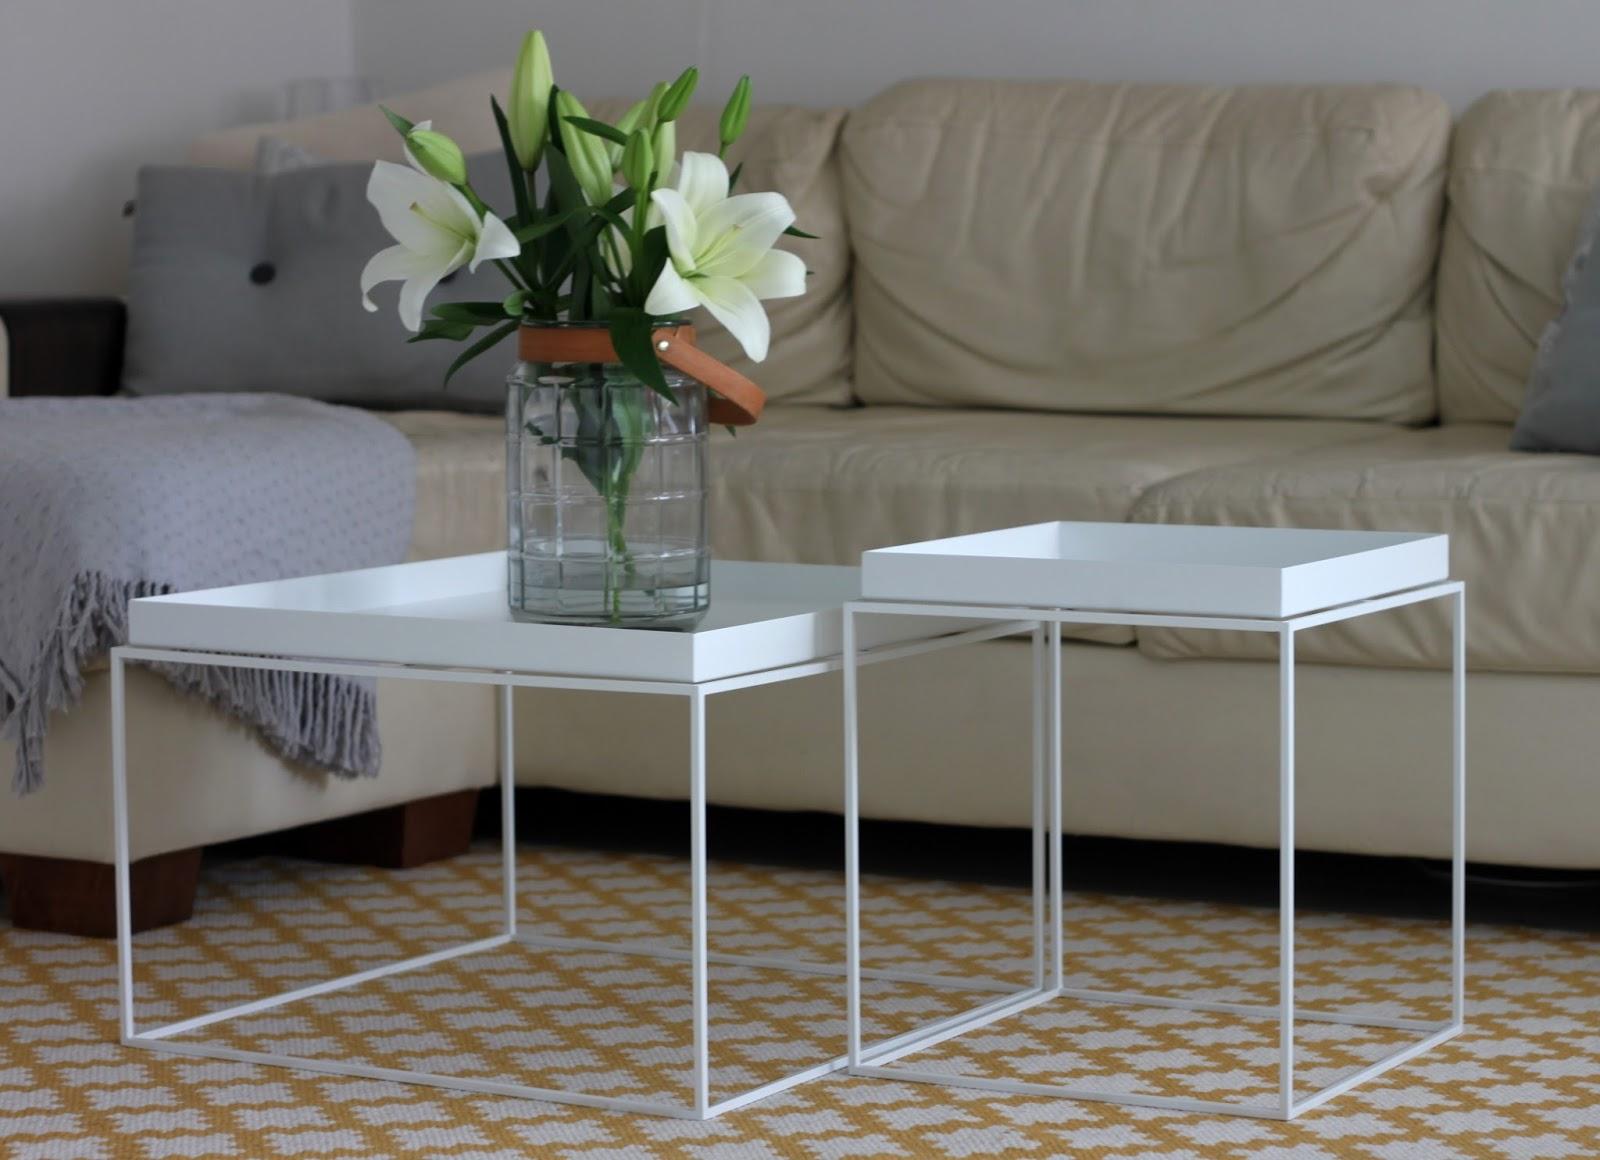 urbaani is hay tray tarjotinp yt. Black Bedroom Furniture Sets. Home Design Ideas